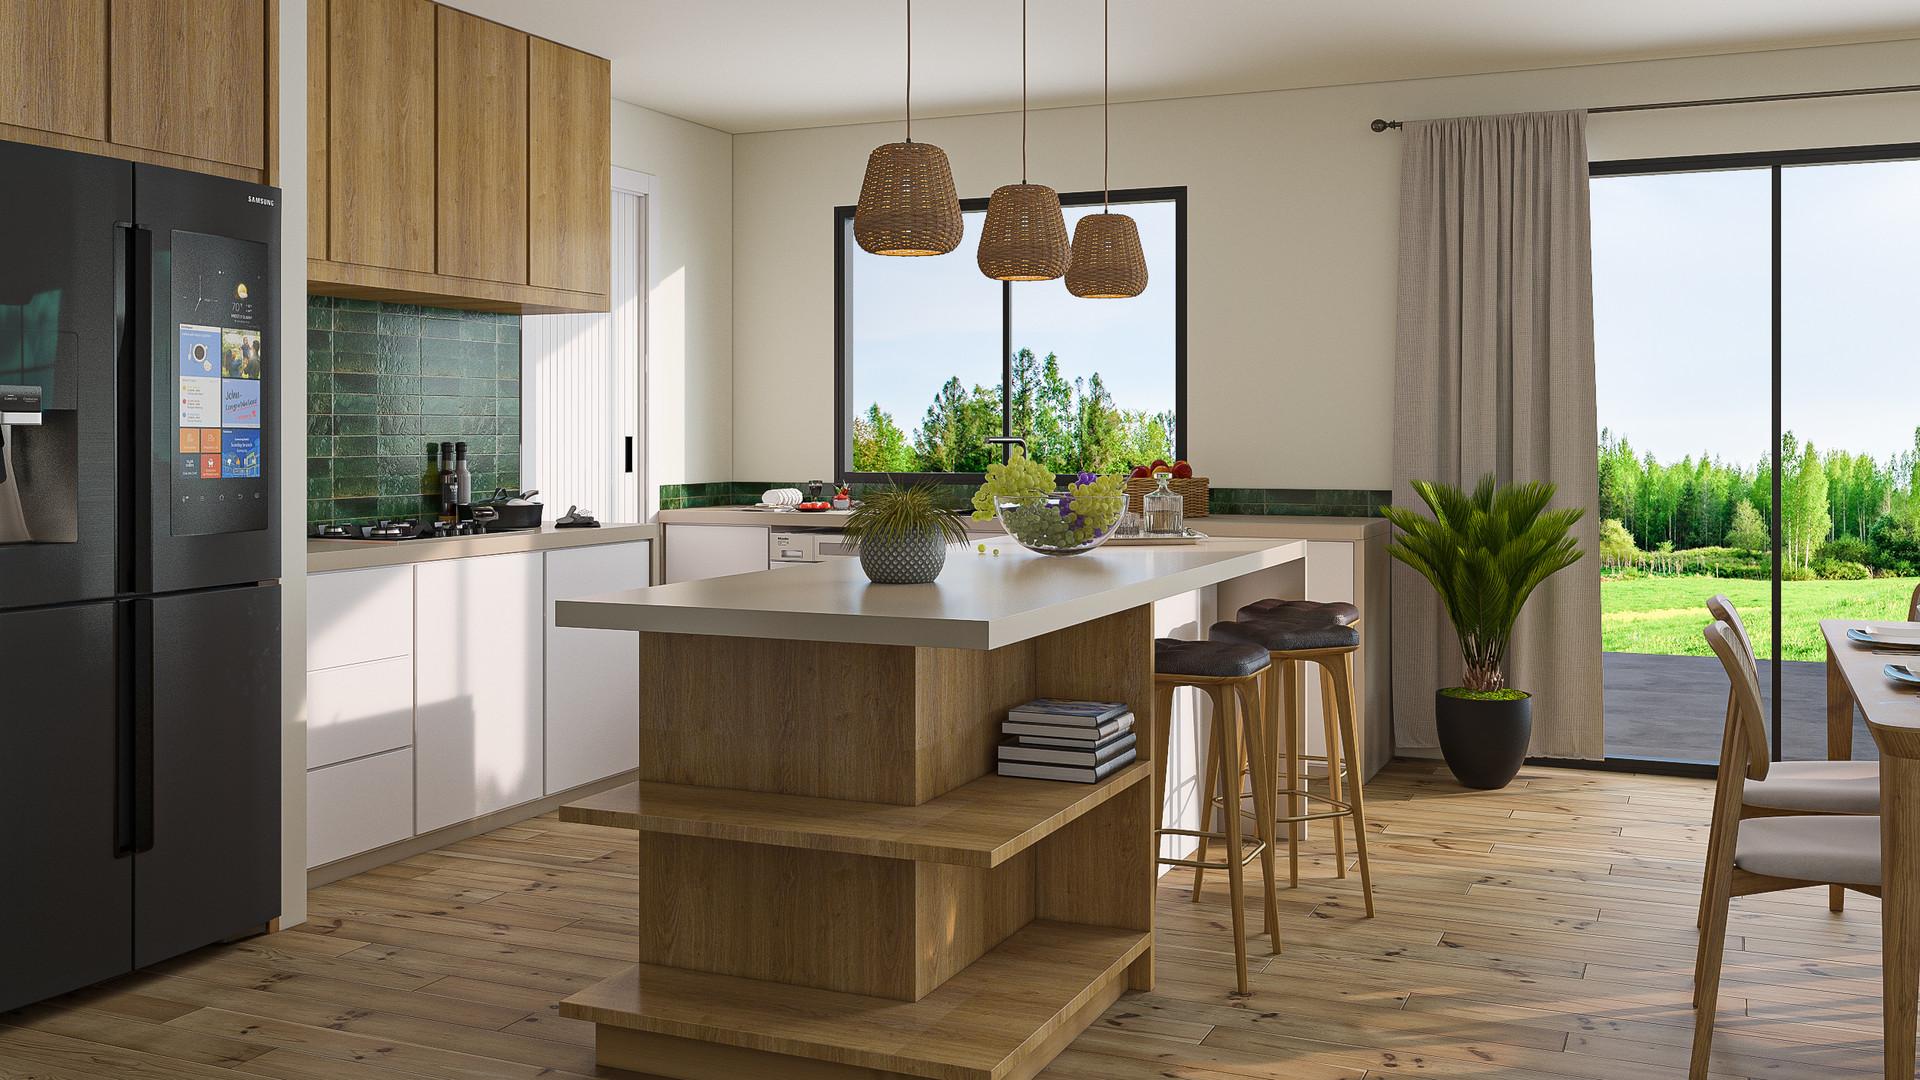 Pisa Moorings kitchen